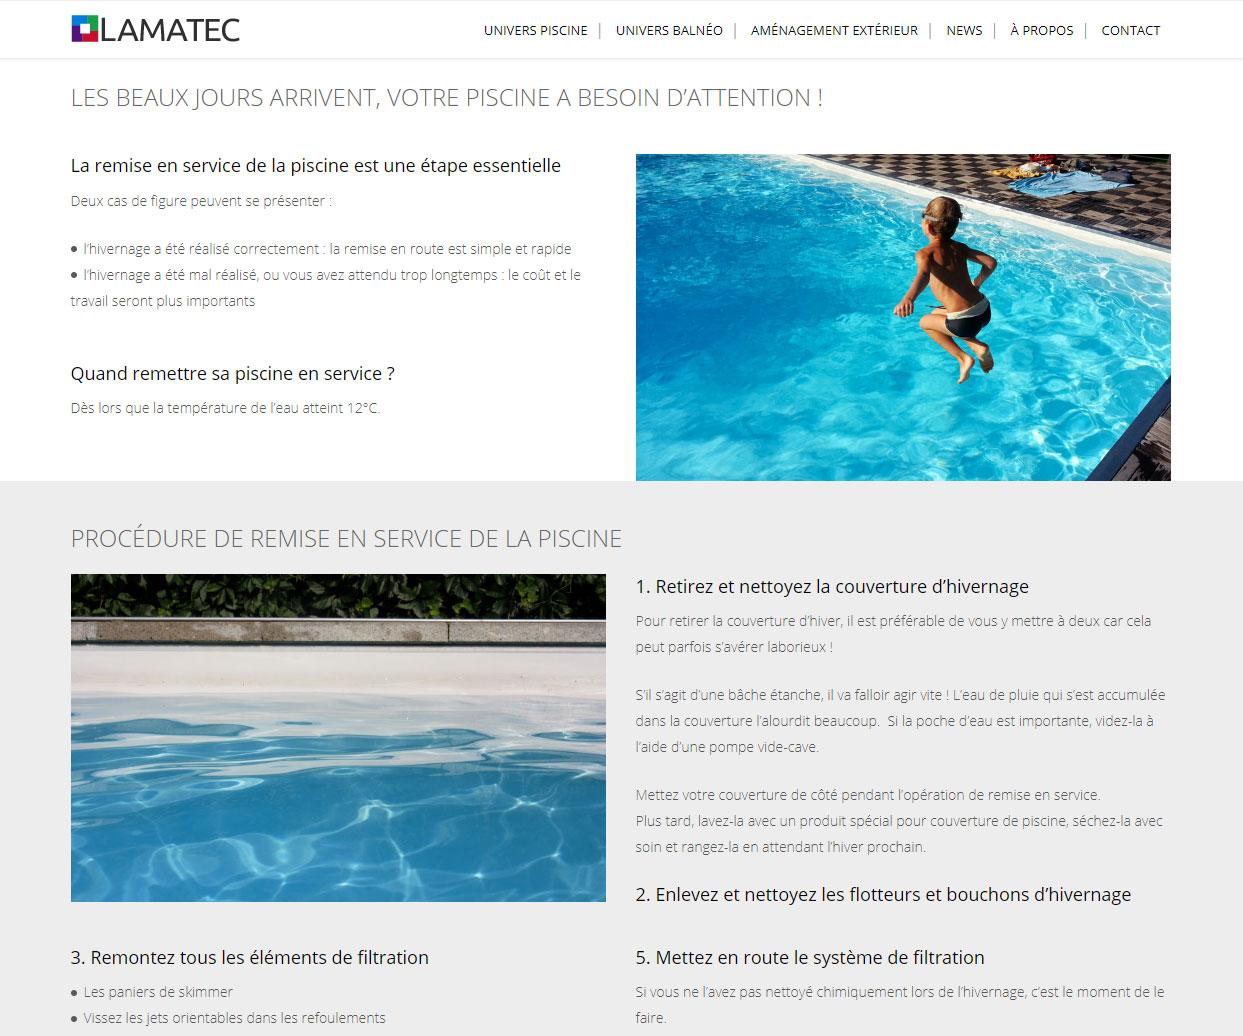 Page Entretien de la piscine